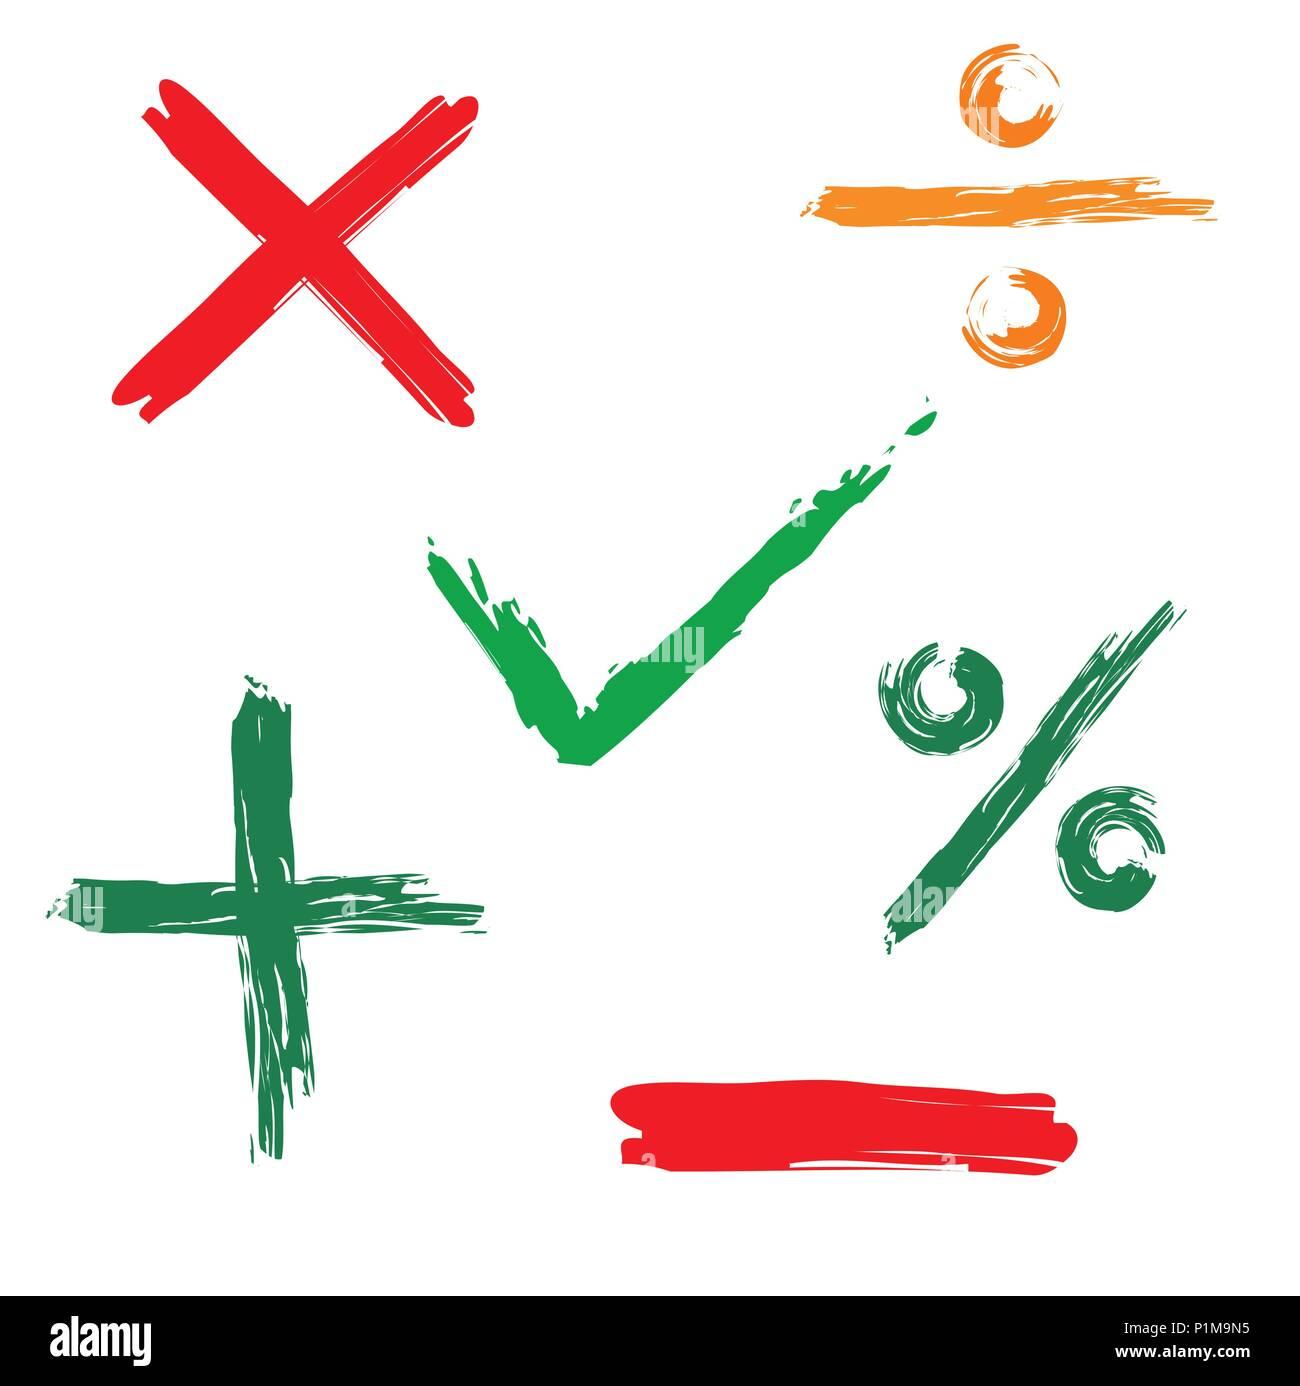 Tick, cross, positive, negative web icon - Stock Image